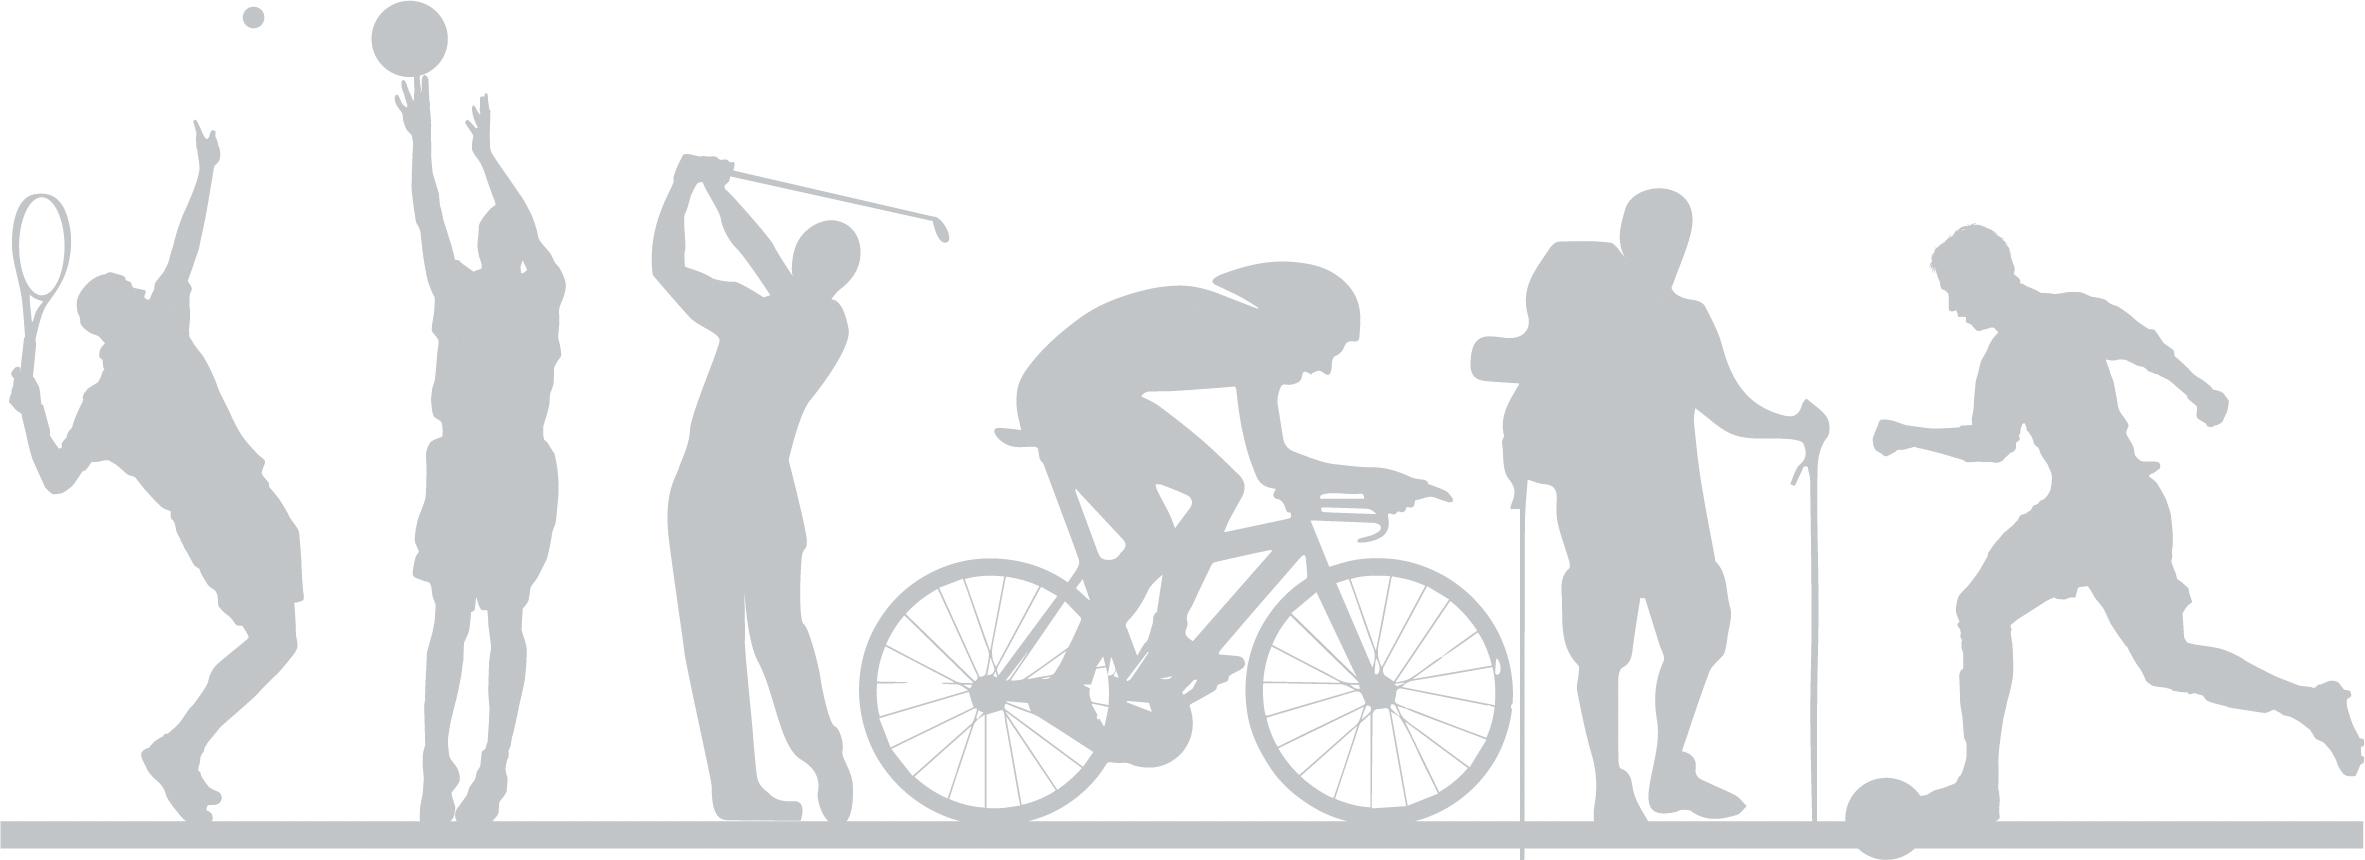 HELOME-Sportler-4c-Sport